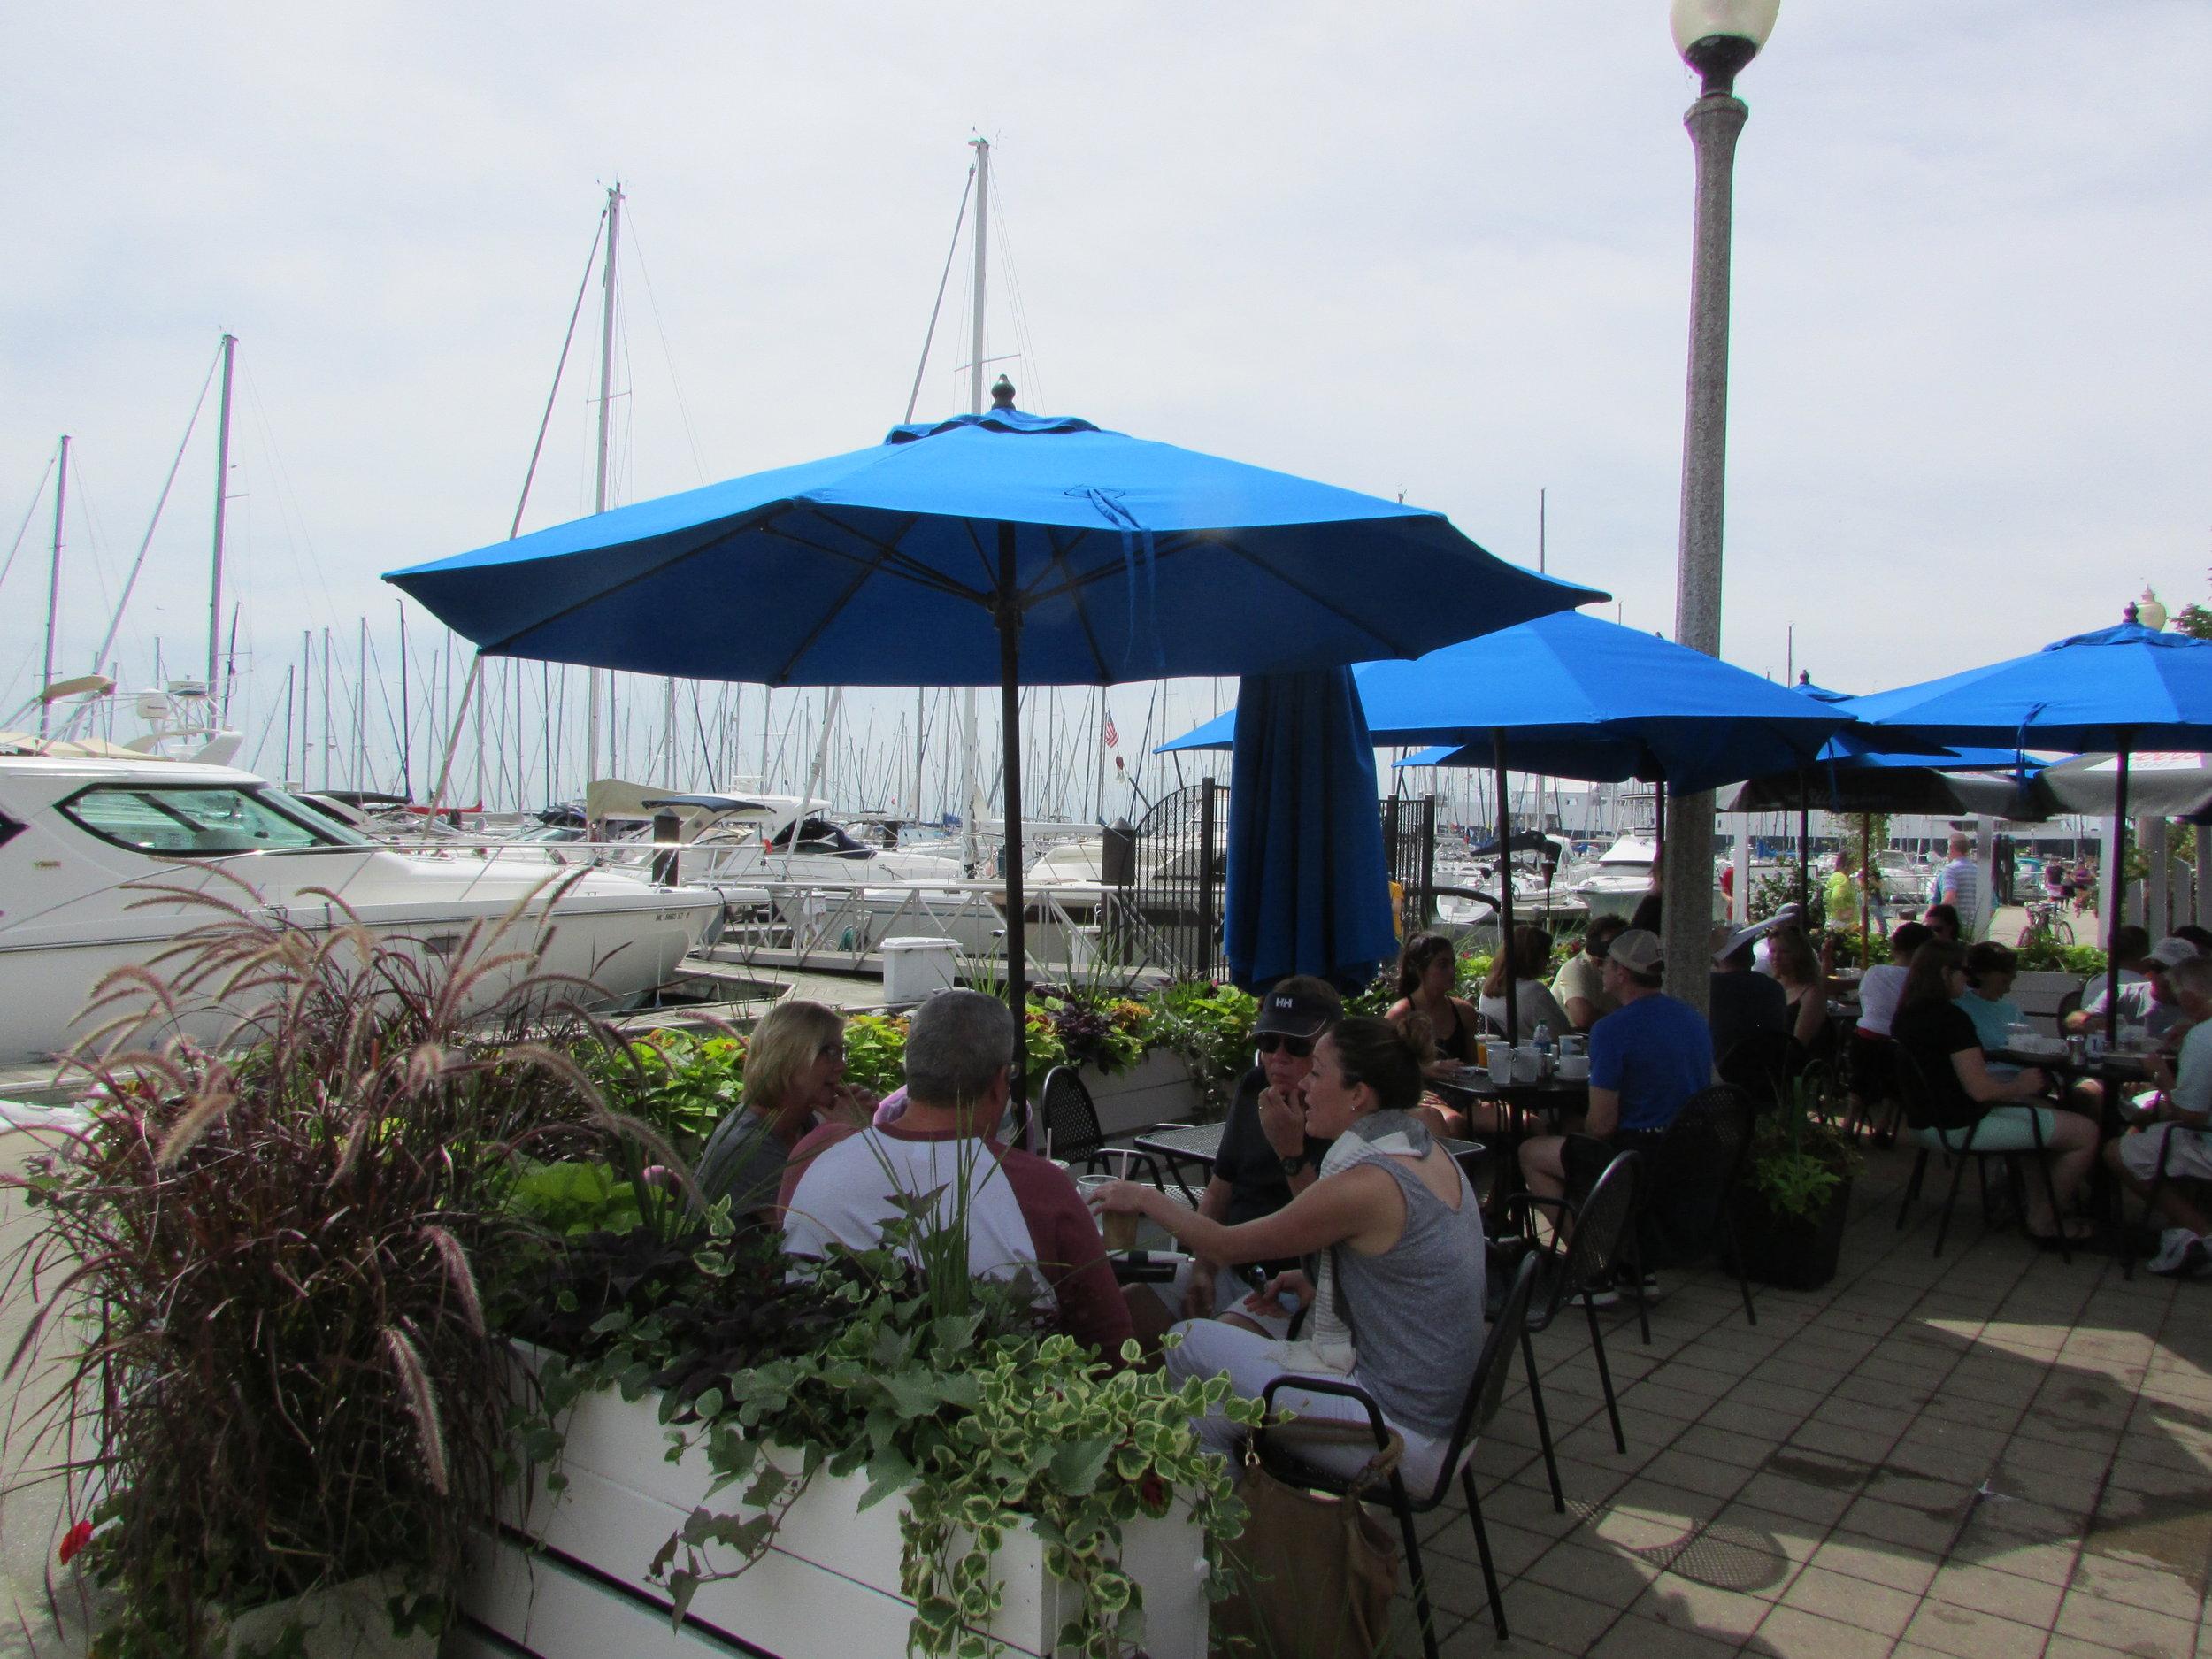 Cafe Michelle at Dusable Harbor - $$, Loop Bar Food, Lakefront, Dog Friendly